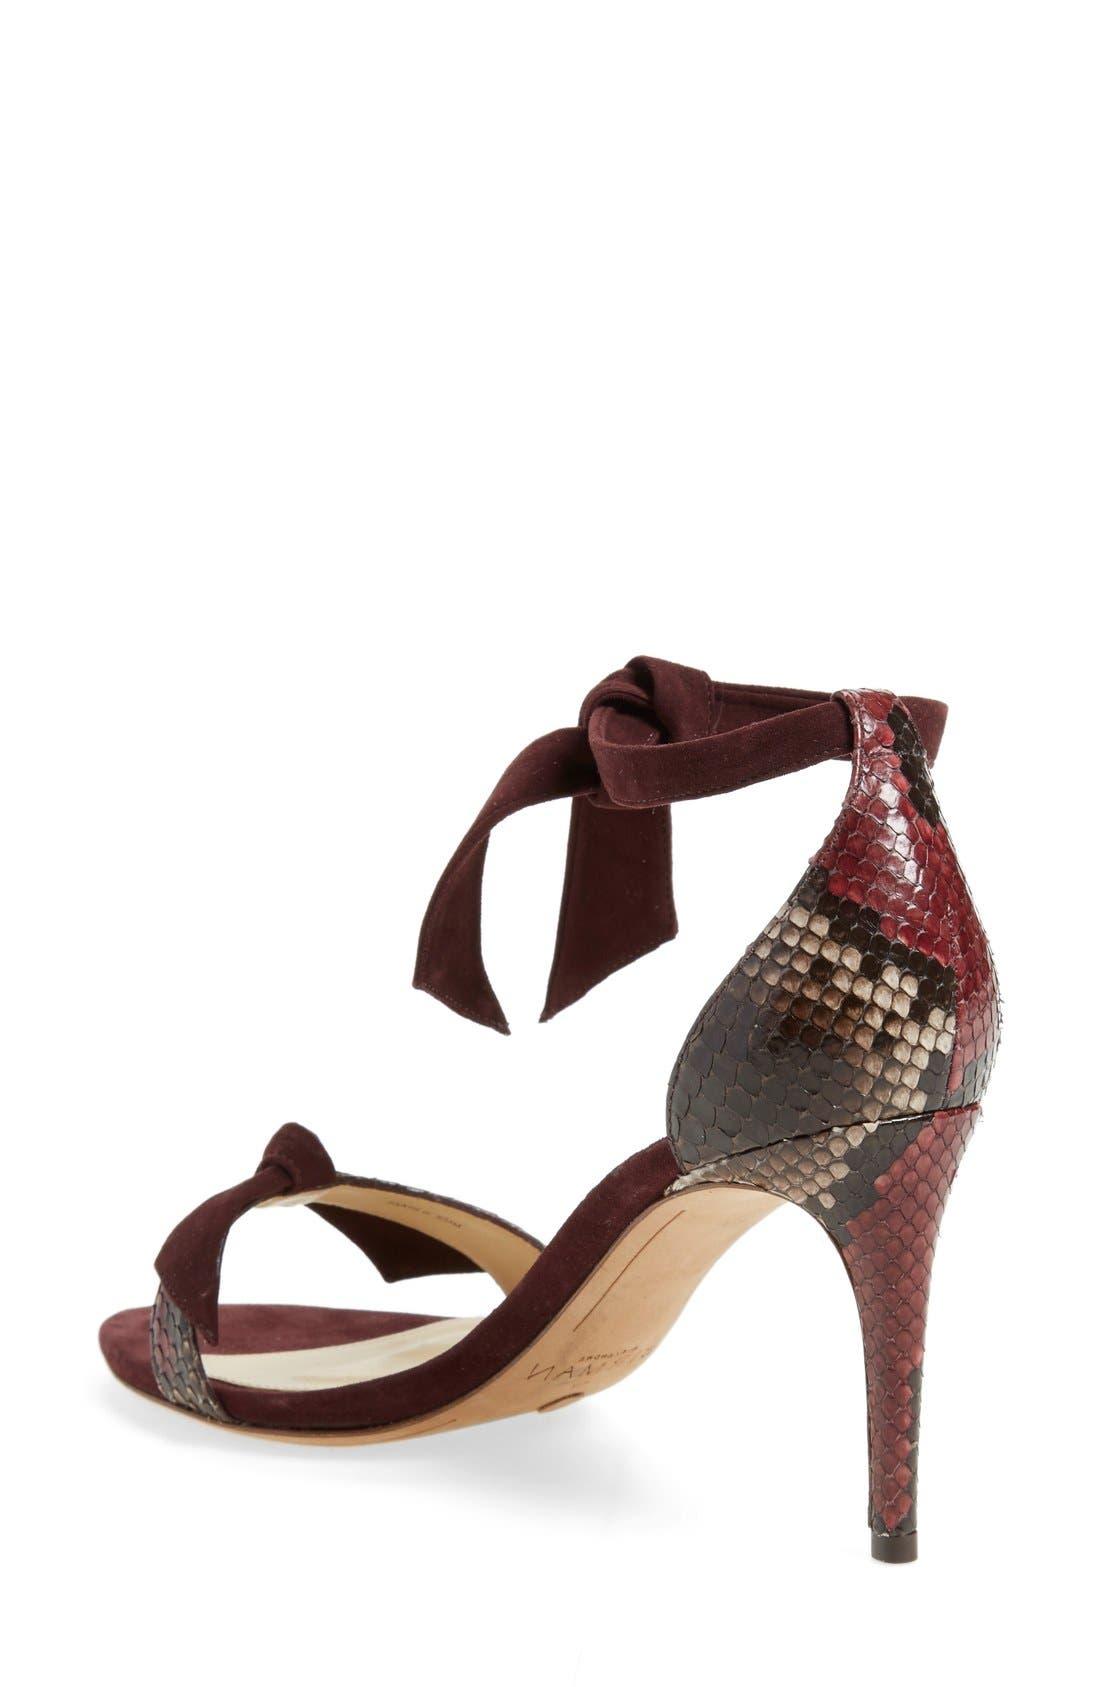 'Clarita' Suede & Genuine Python Ankle Tie Sandal,                             Alternate thumbnail 2, color,                             930